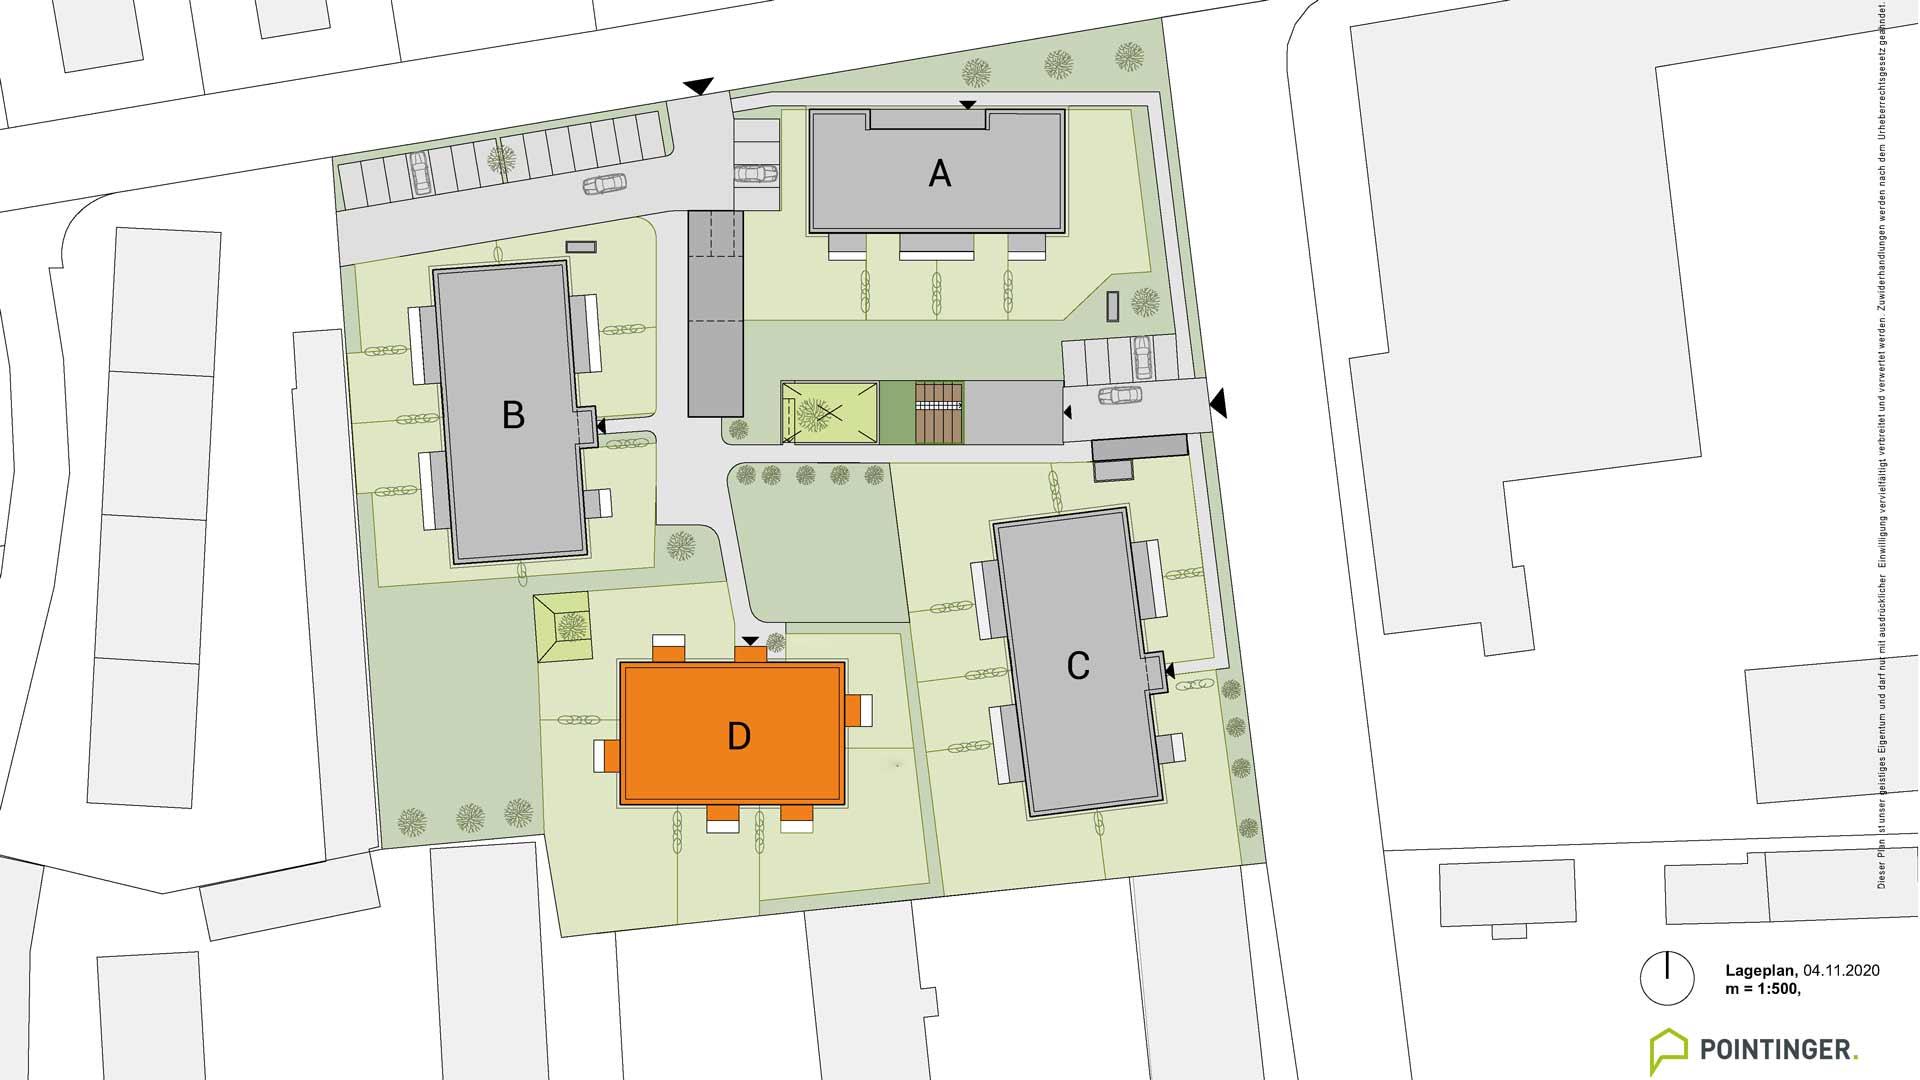 all-in99 Projekt Villach Lageplan Bauteil D orange markiert